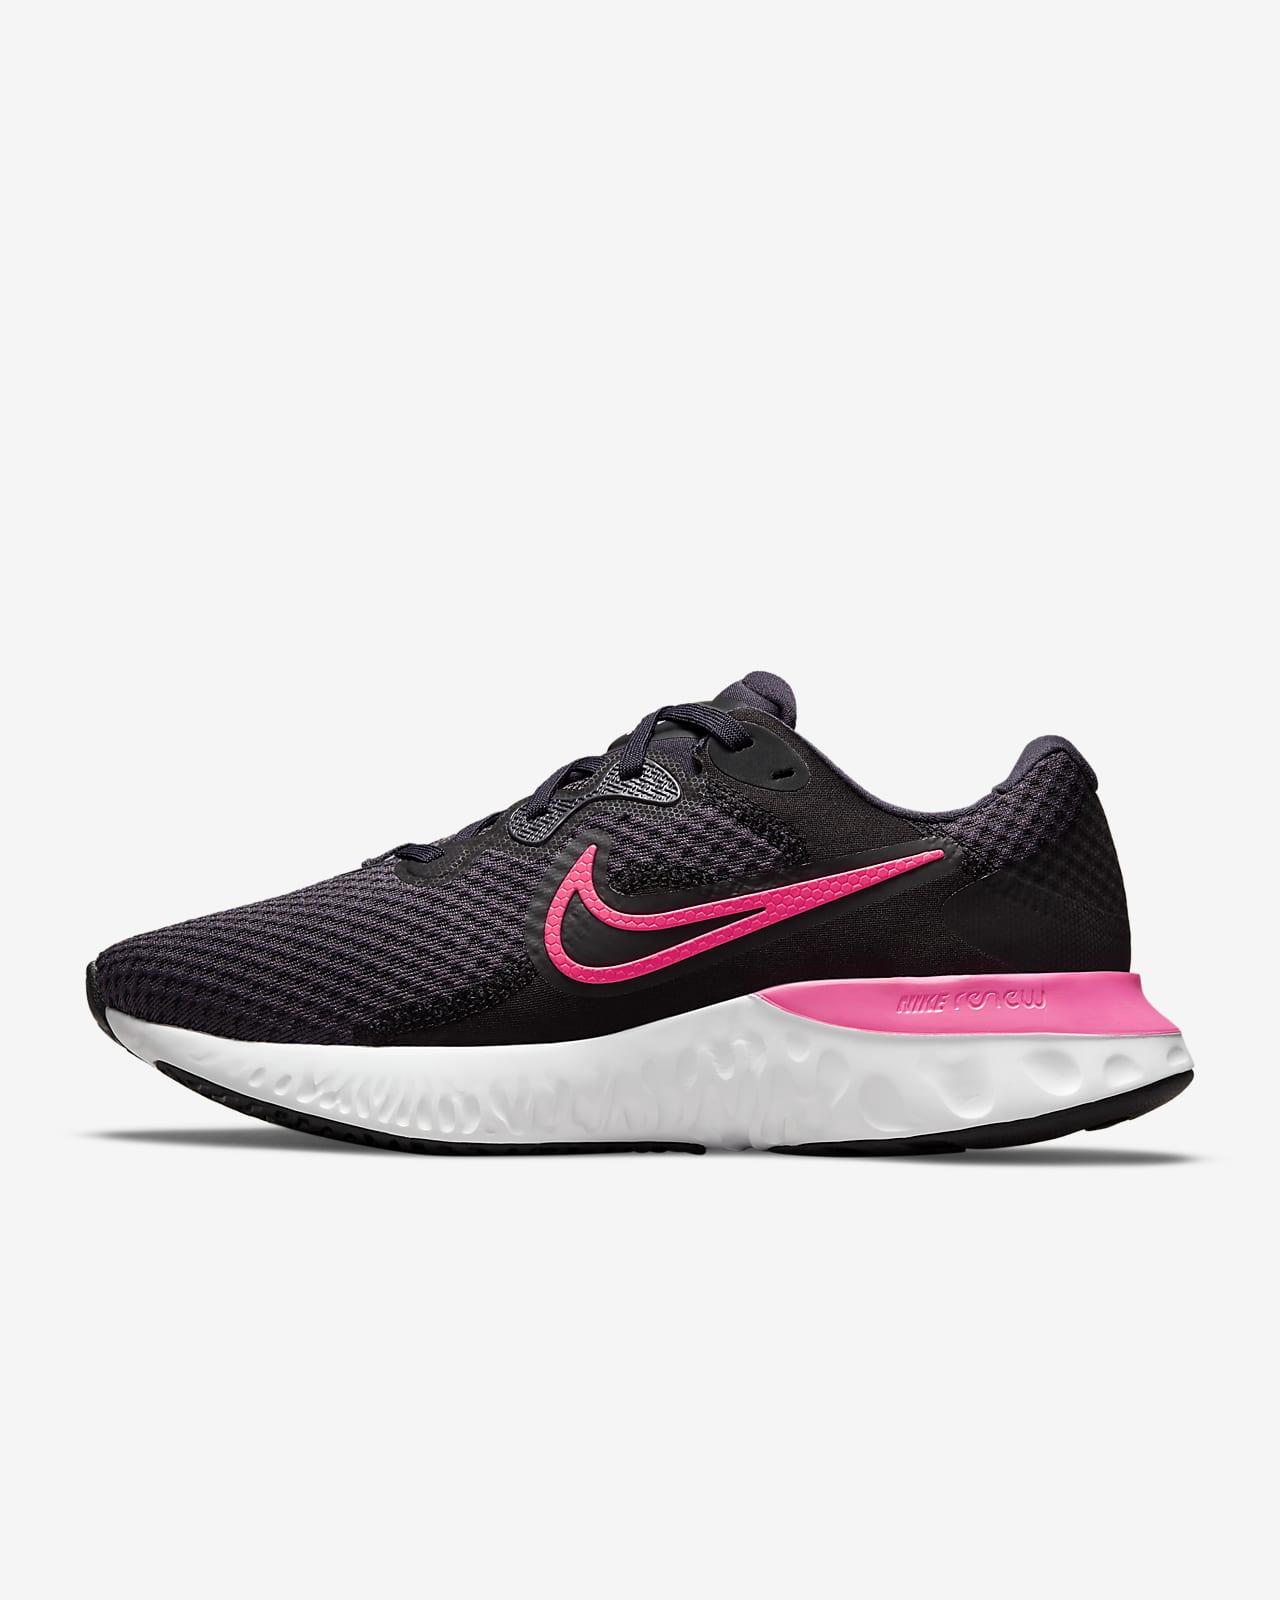 Nike Renew Ride 2 Damen-Straßenlaufschuh